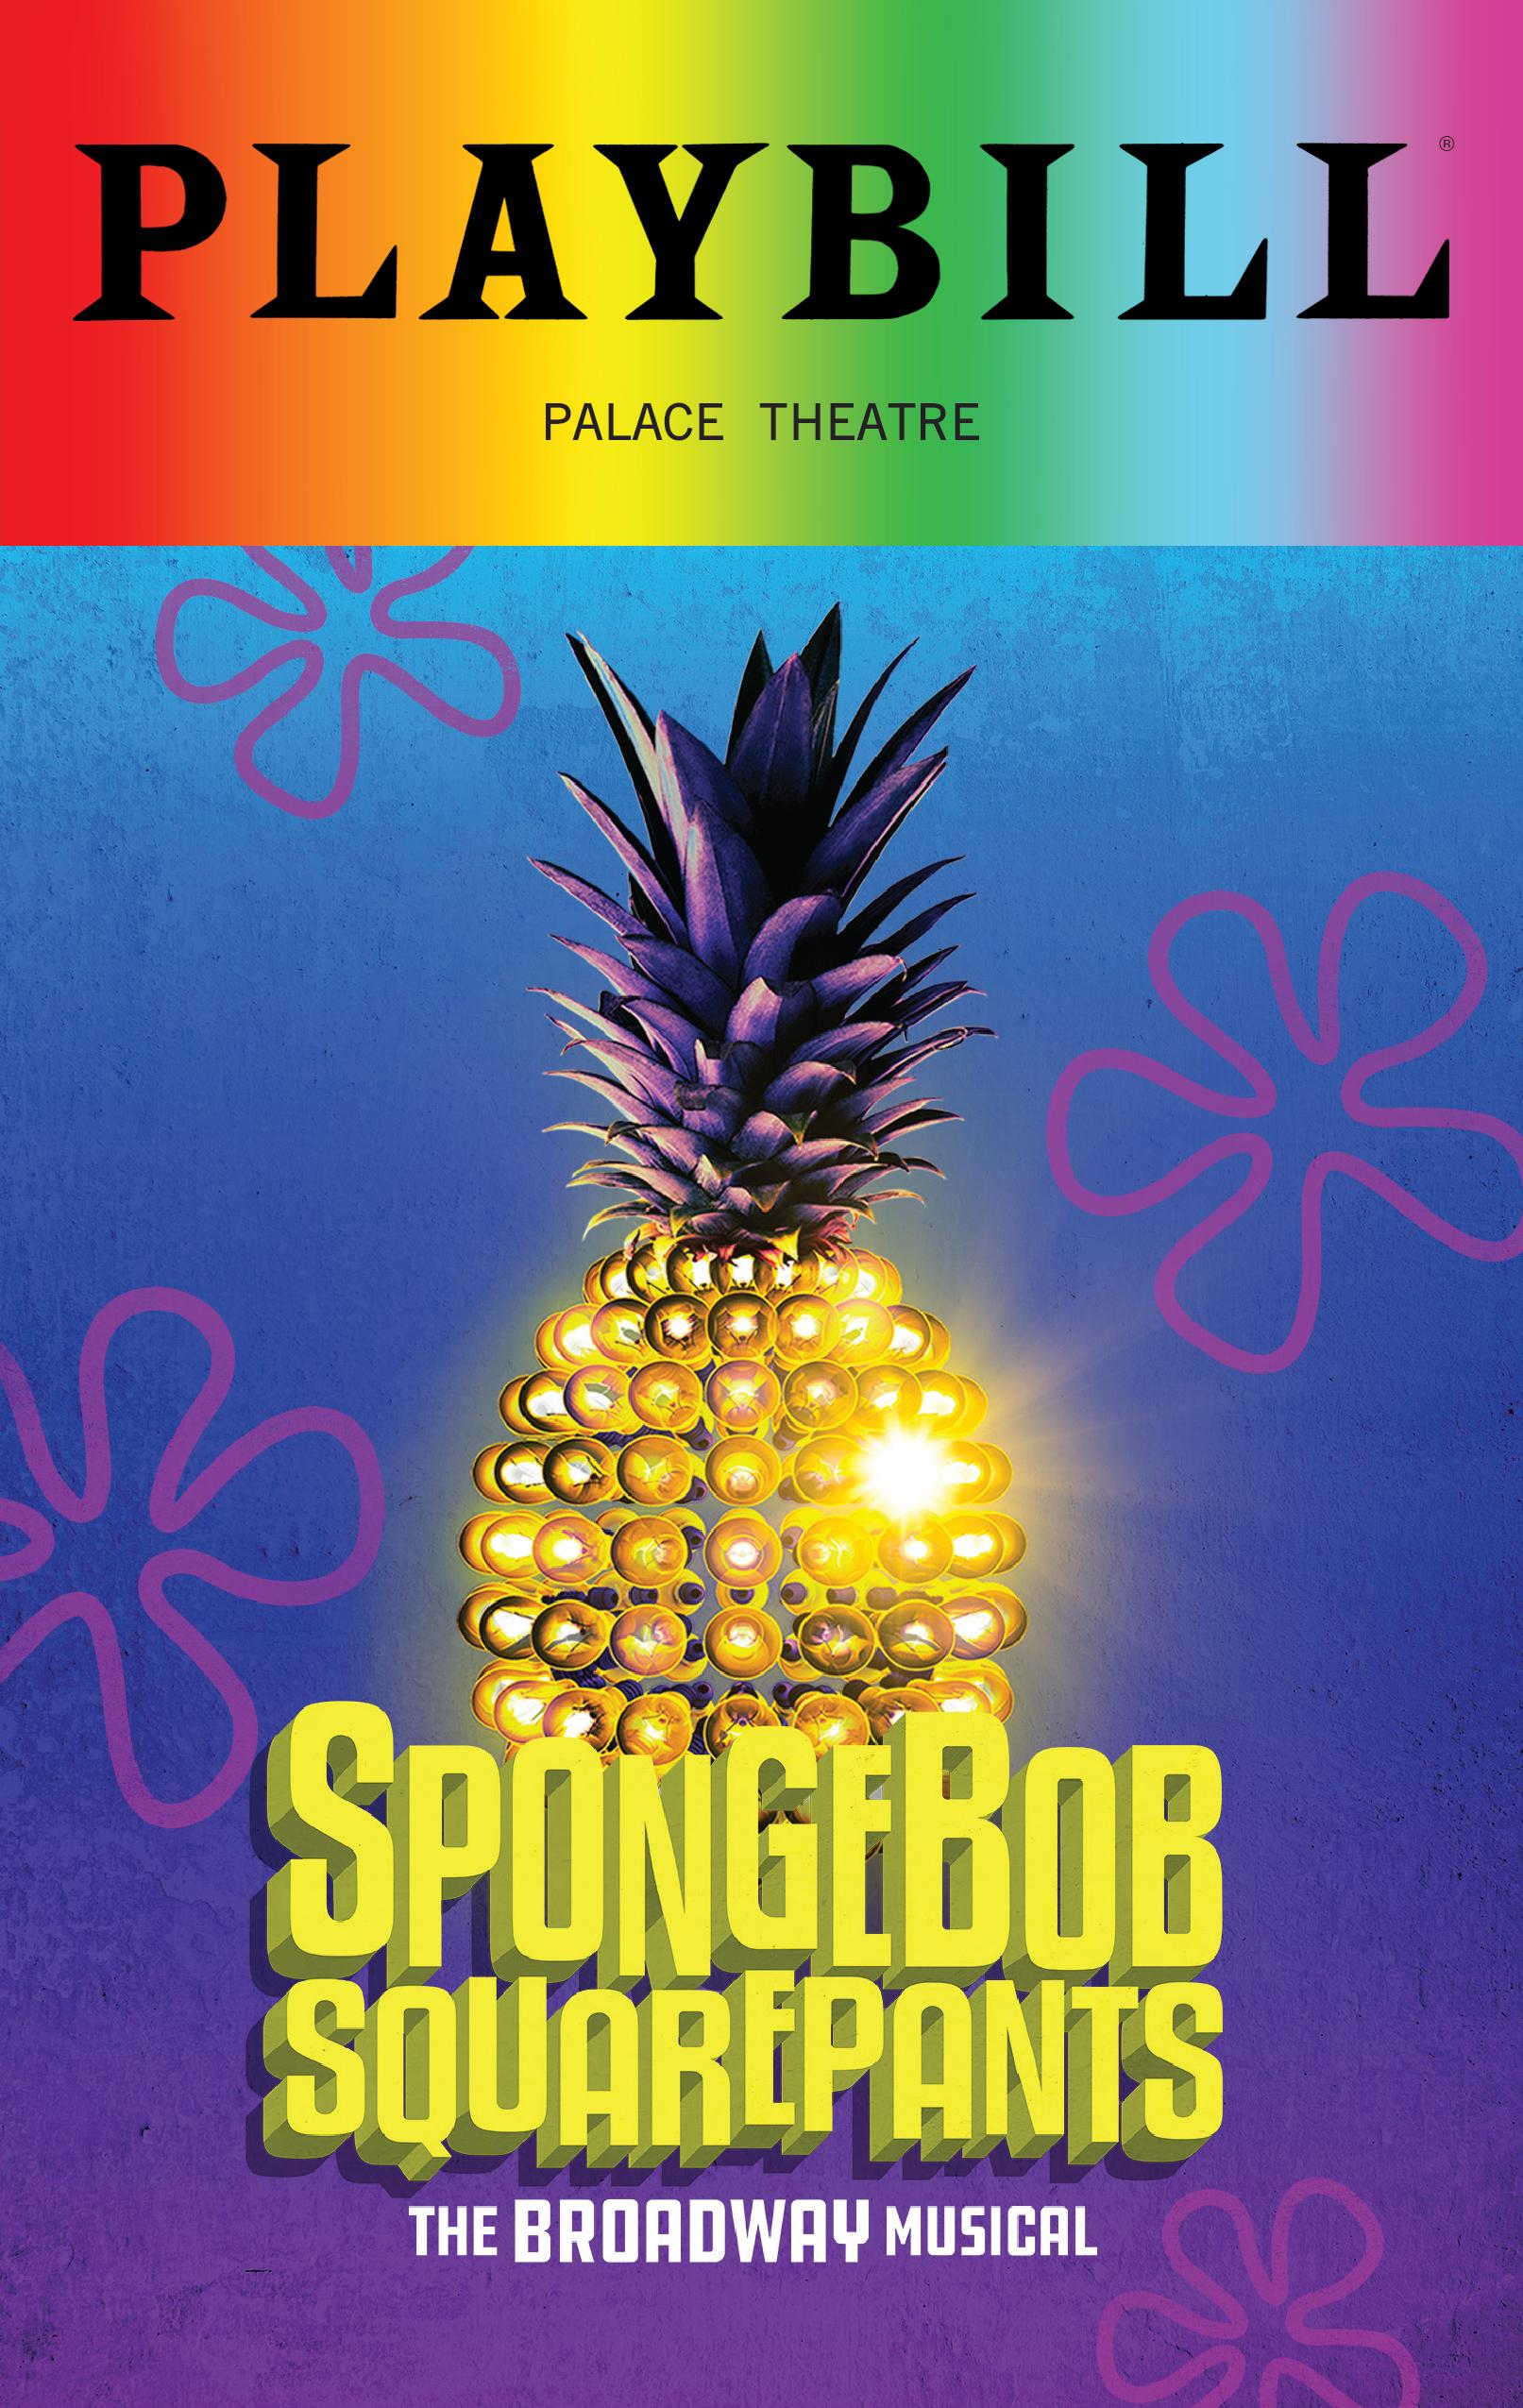 Spongebob Squarepants June 2018 Playbill With Rainbow